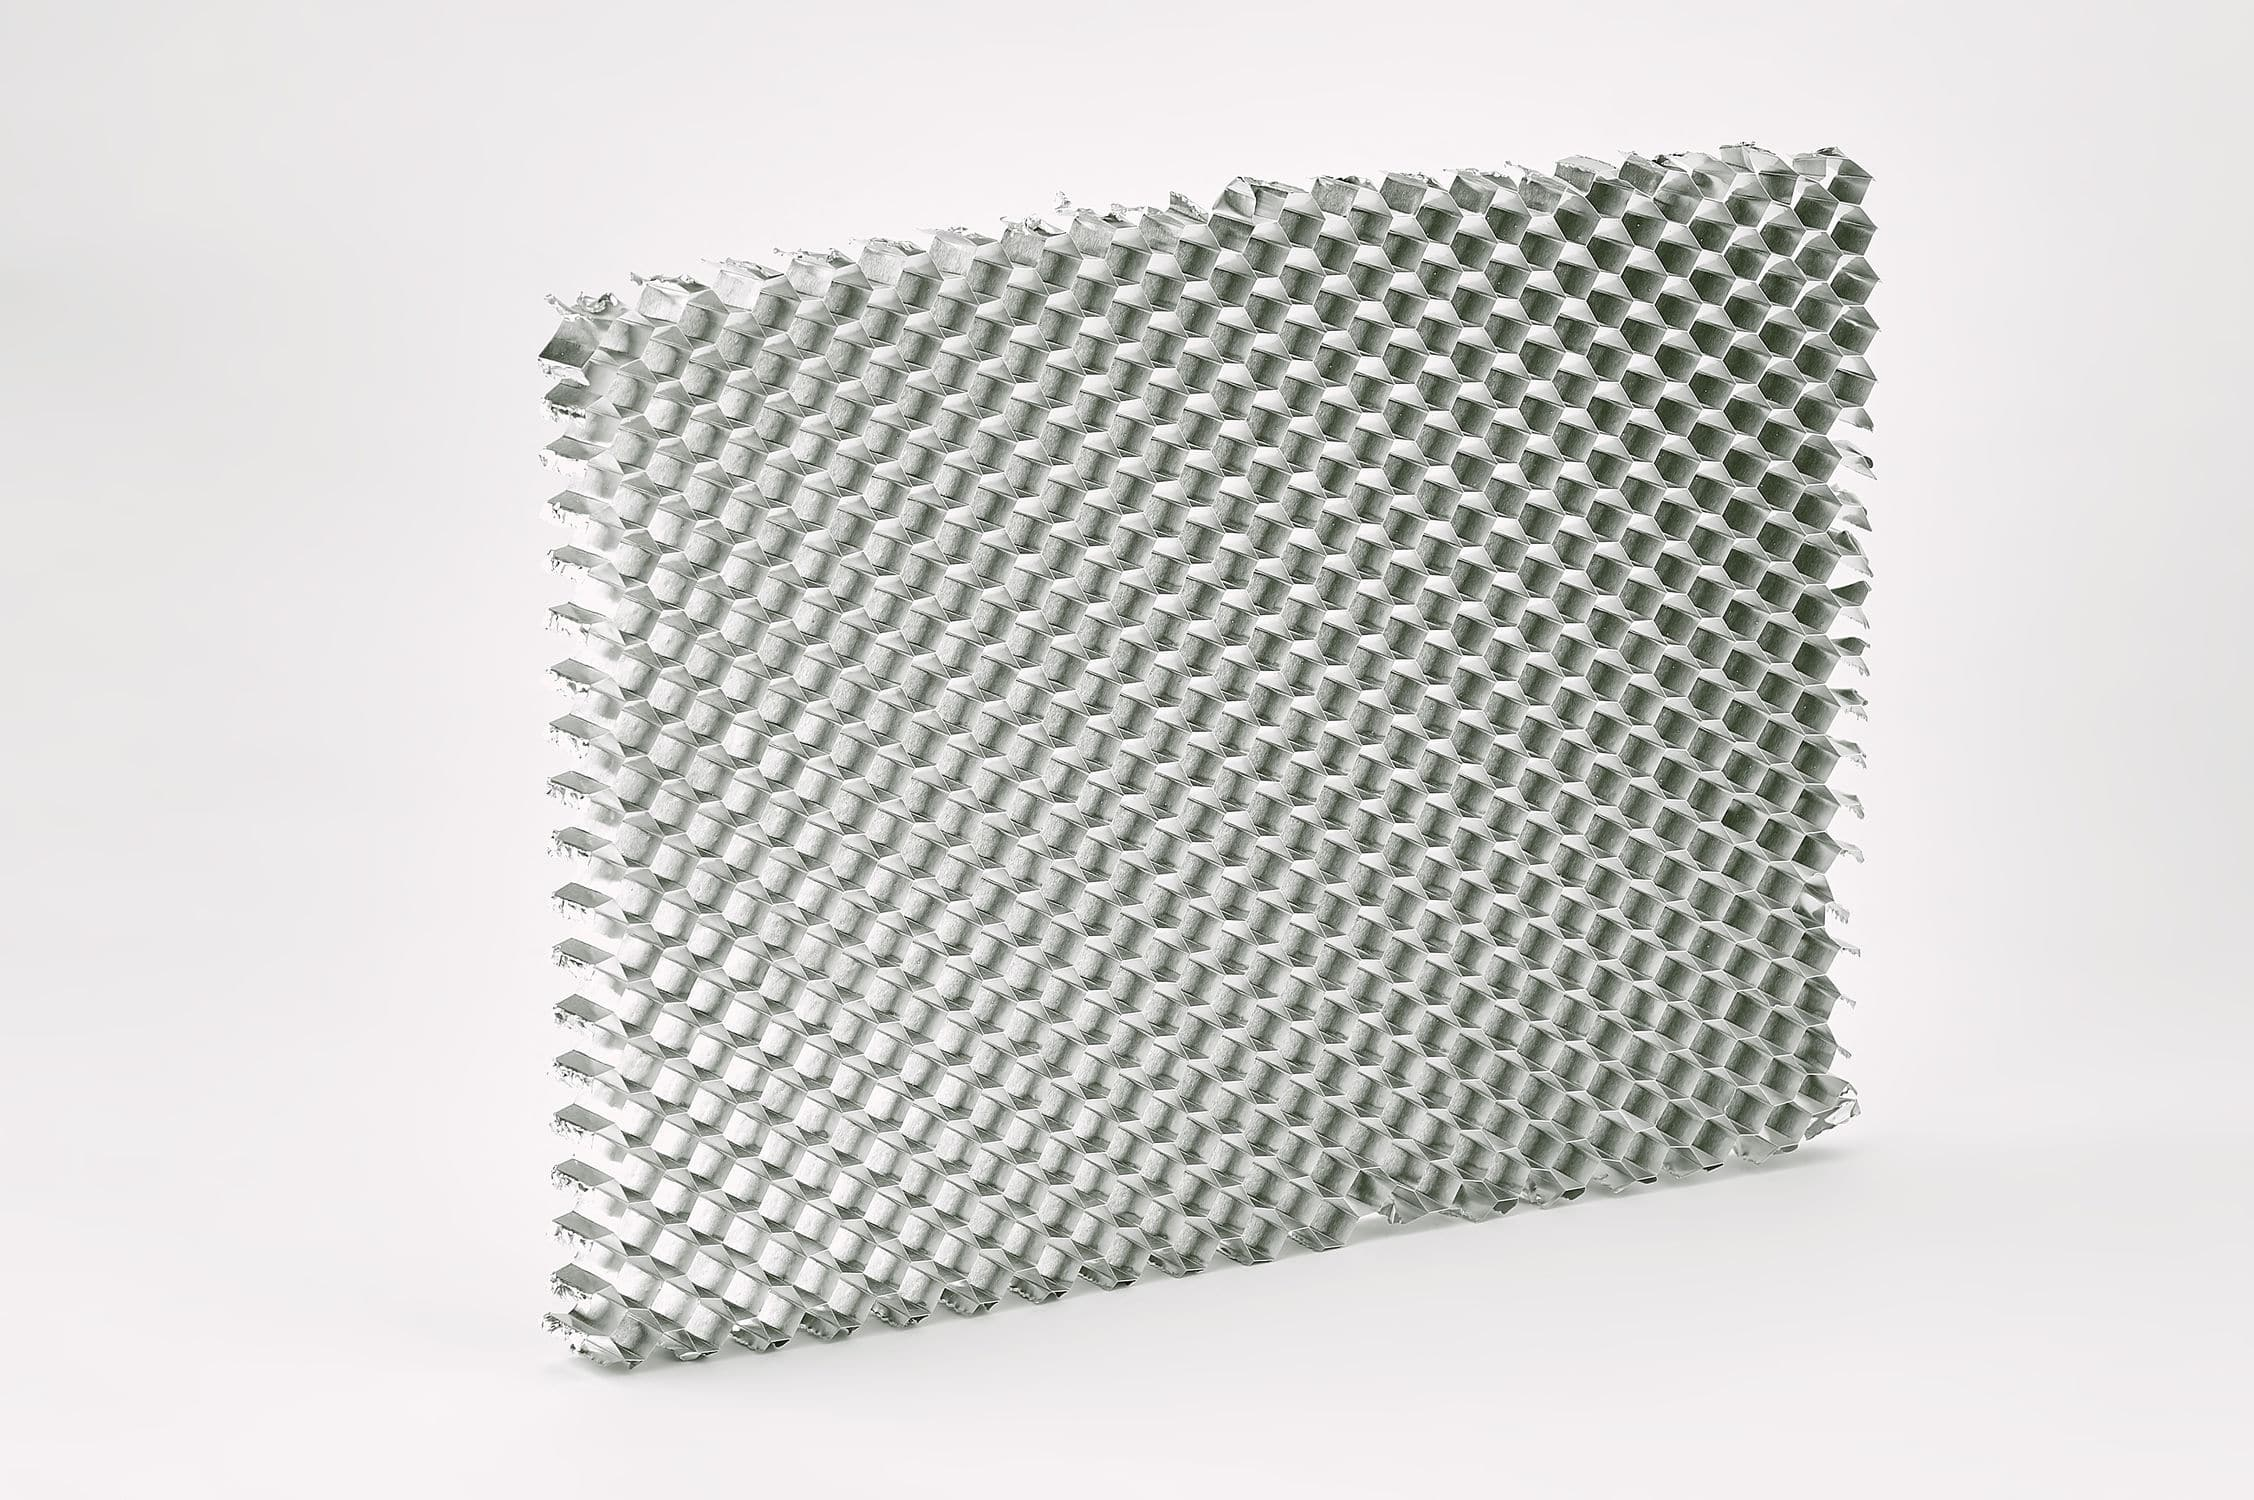 Alma De Nido De Abeja De Aluminio Para Panel S Ndwich  # Muebles Nido De Abeja